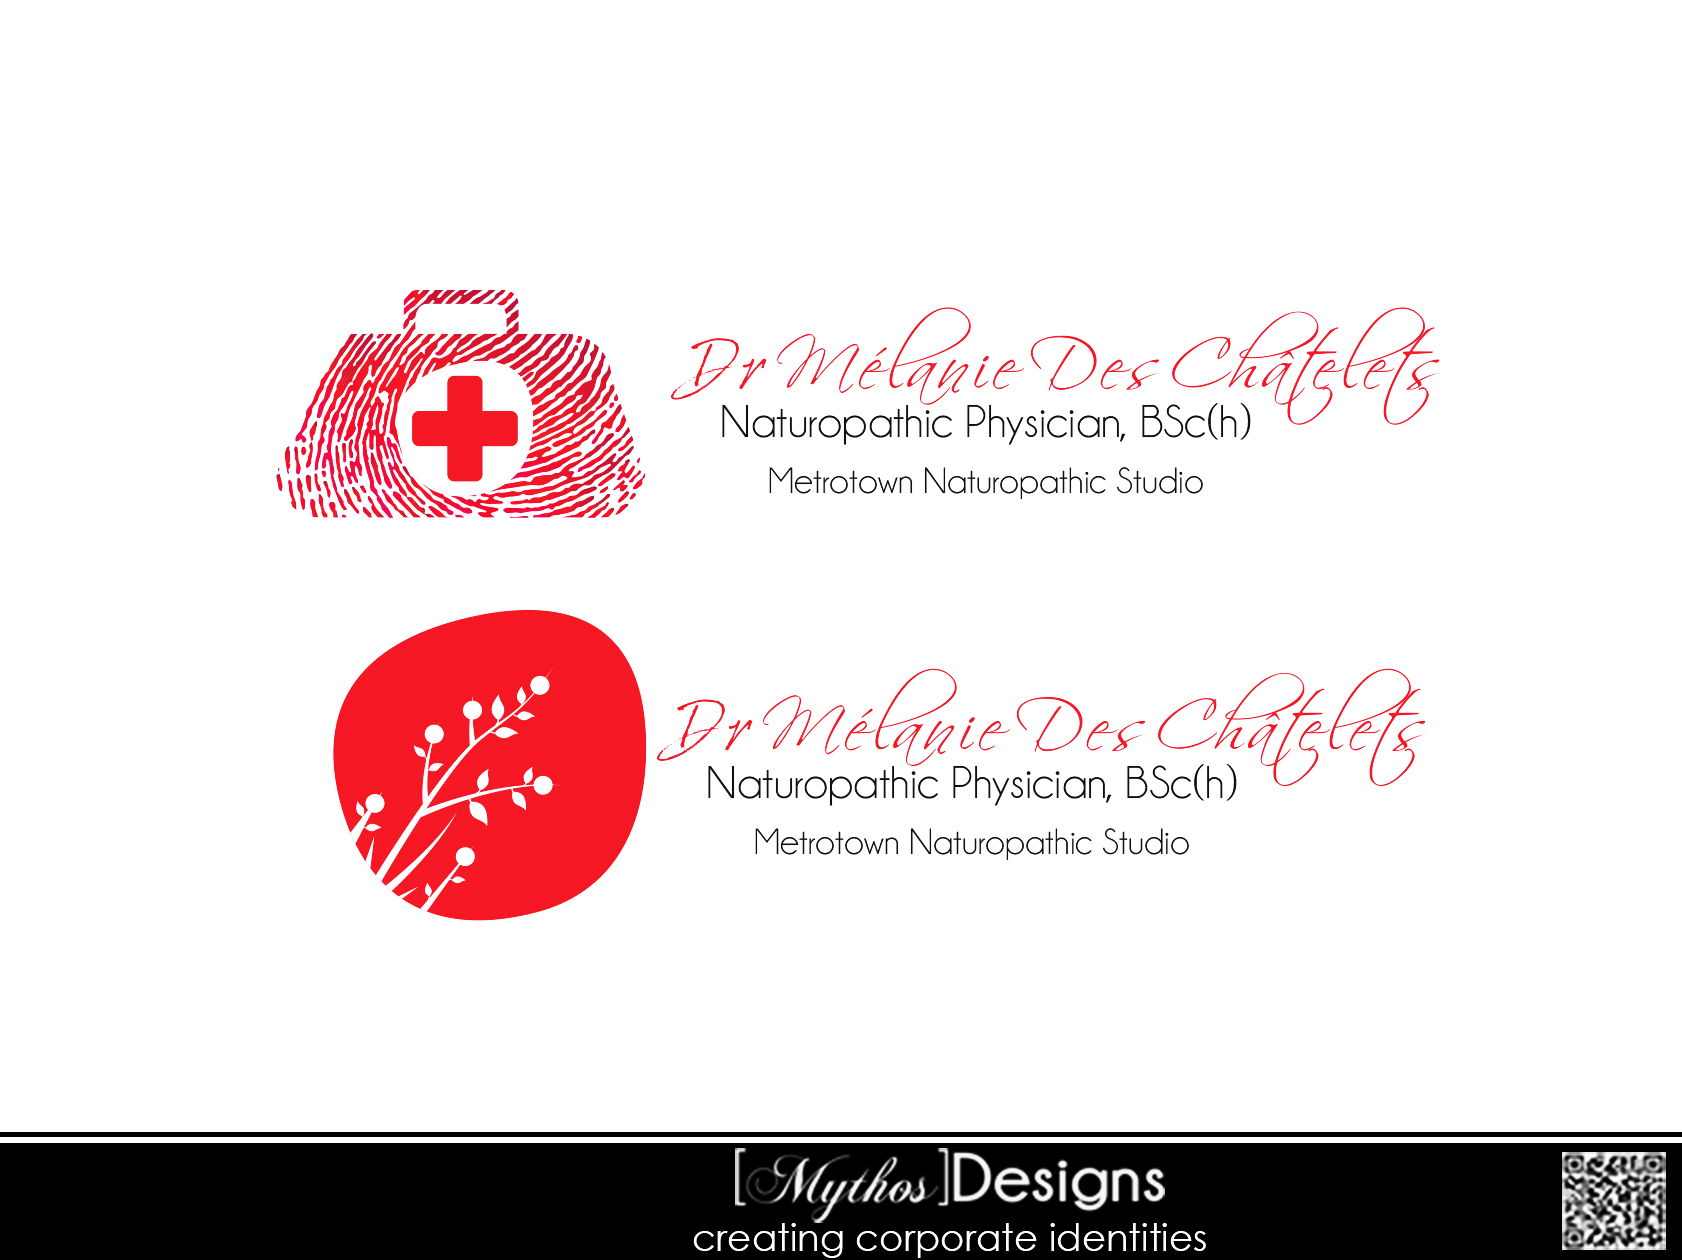 Logo Design by Mythos Designs - Entry No. 72 in the Logo Design Contest Artistic Logo Design for Dr Mélanie DesChâtelets.